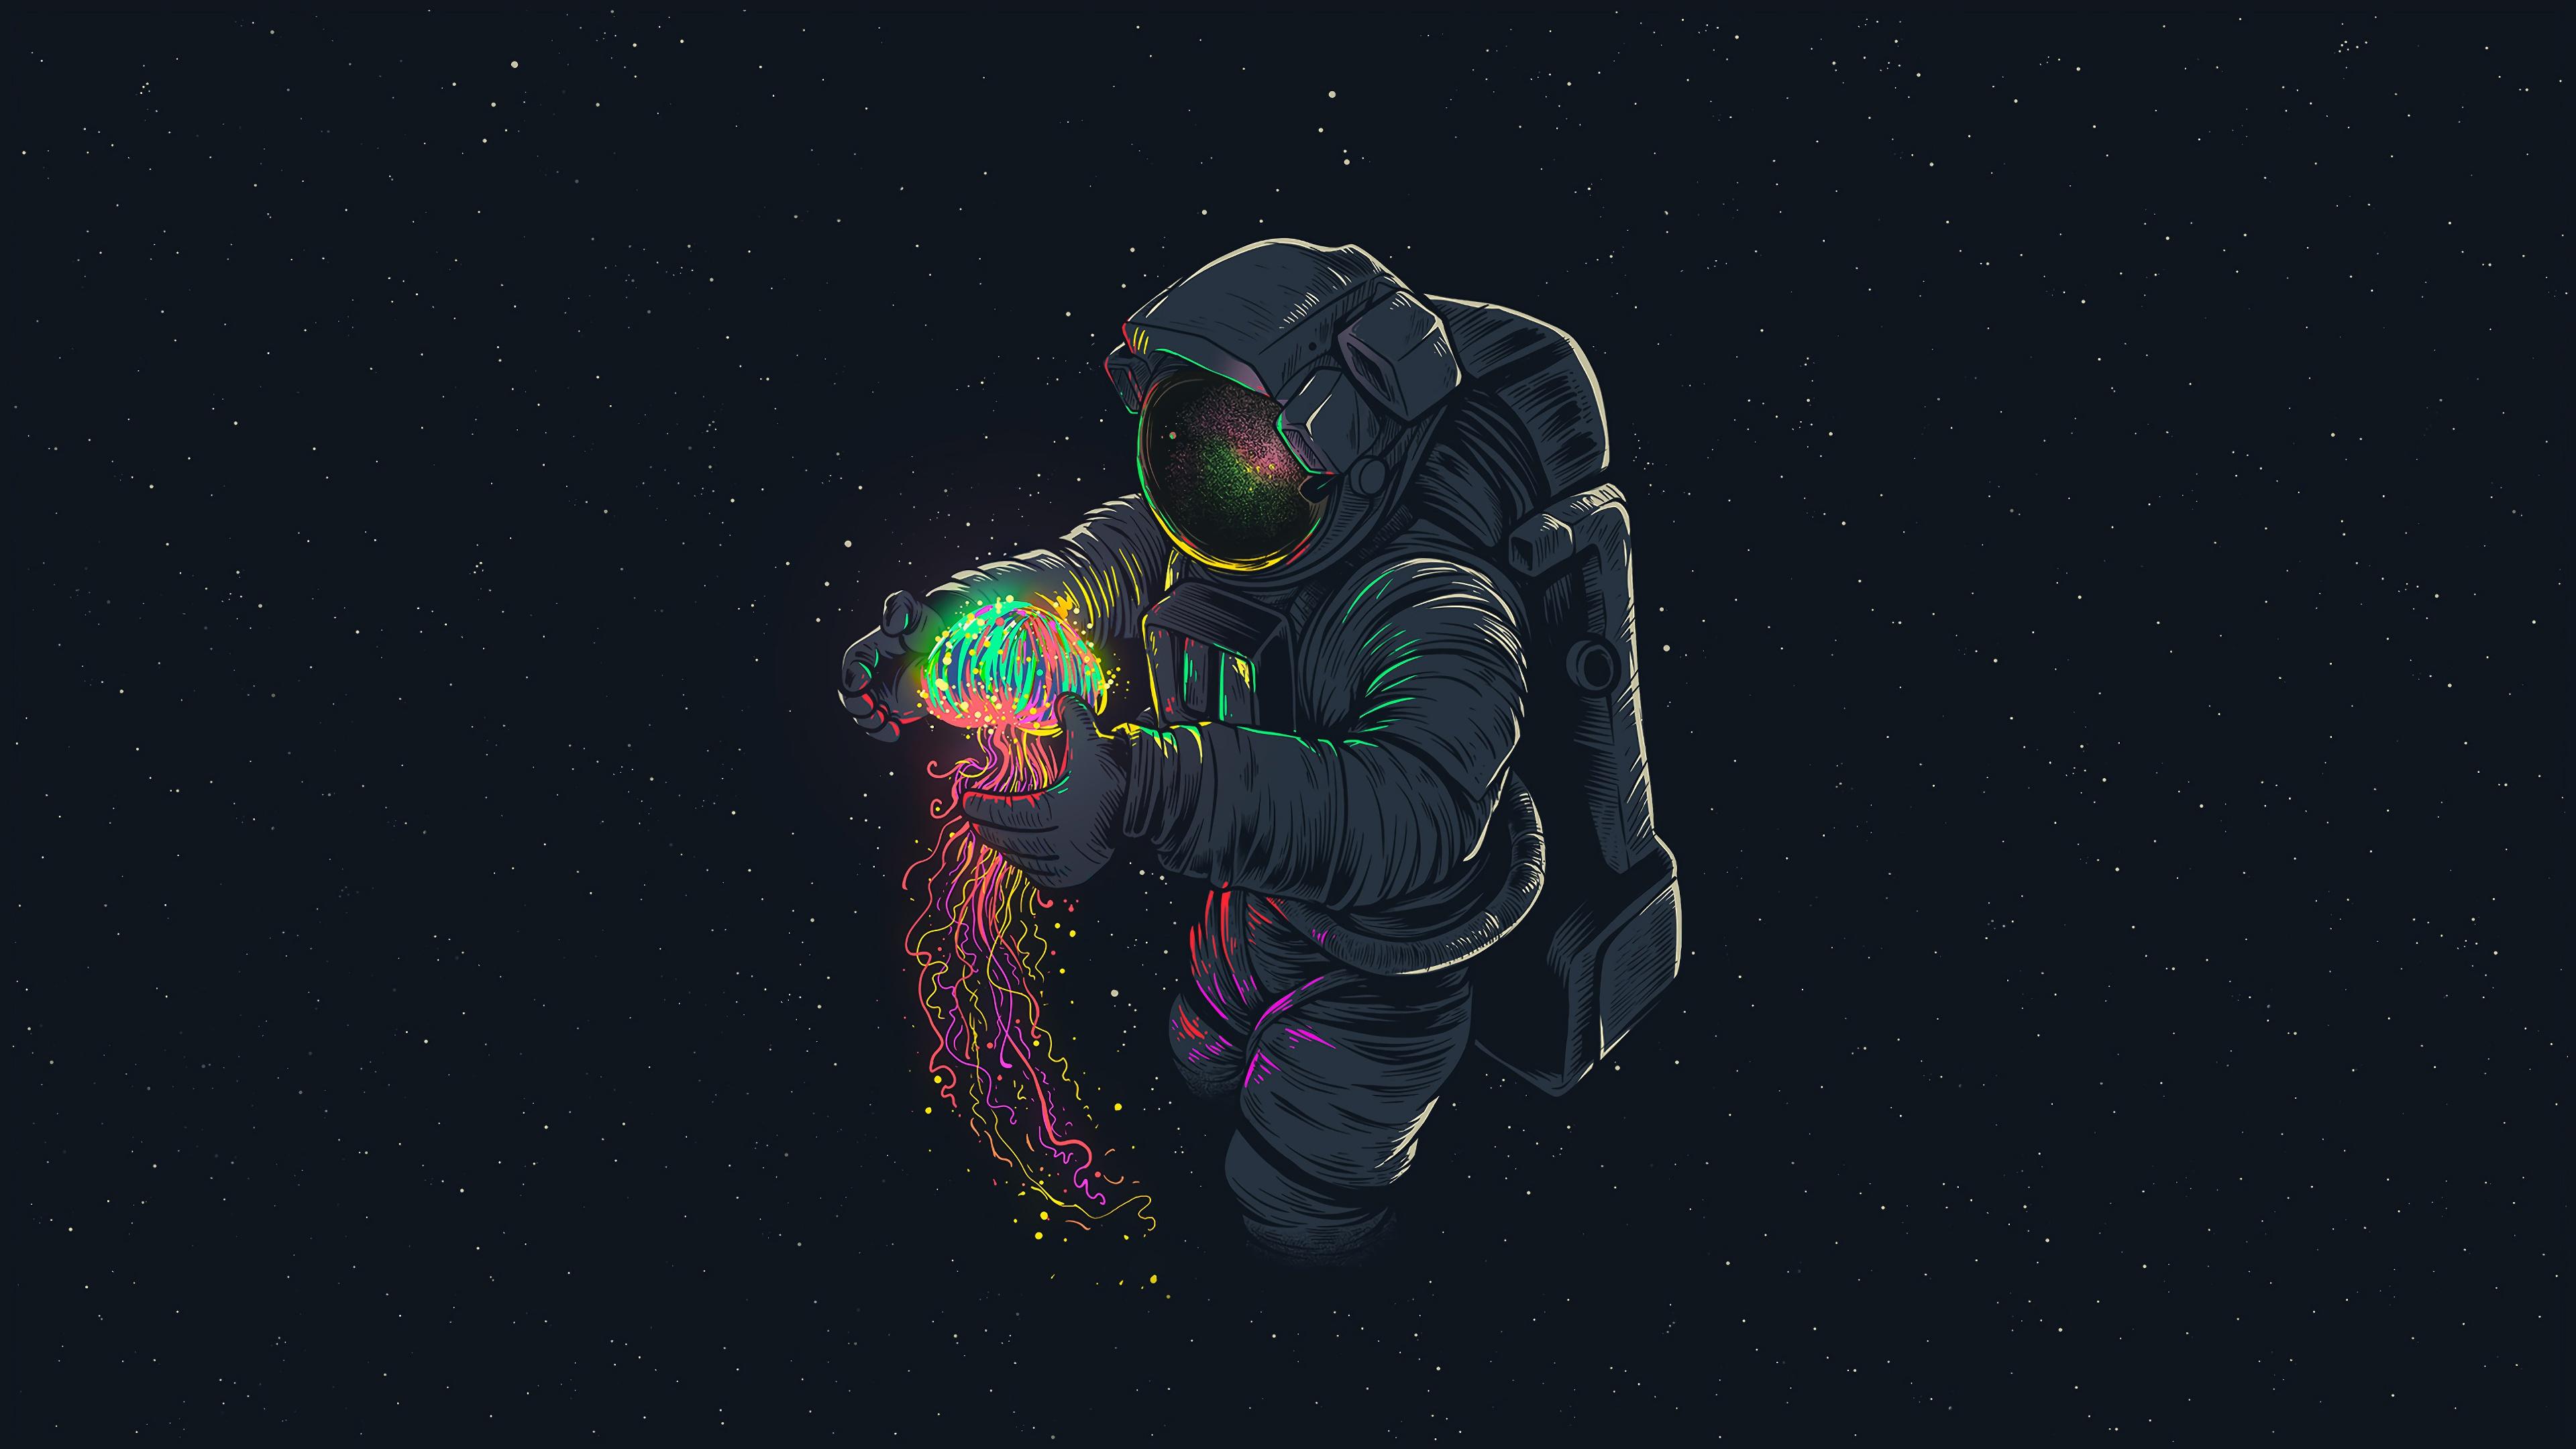 JellyFish Astronaut